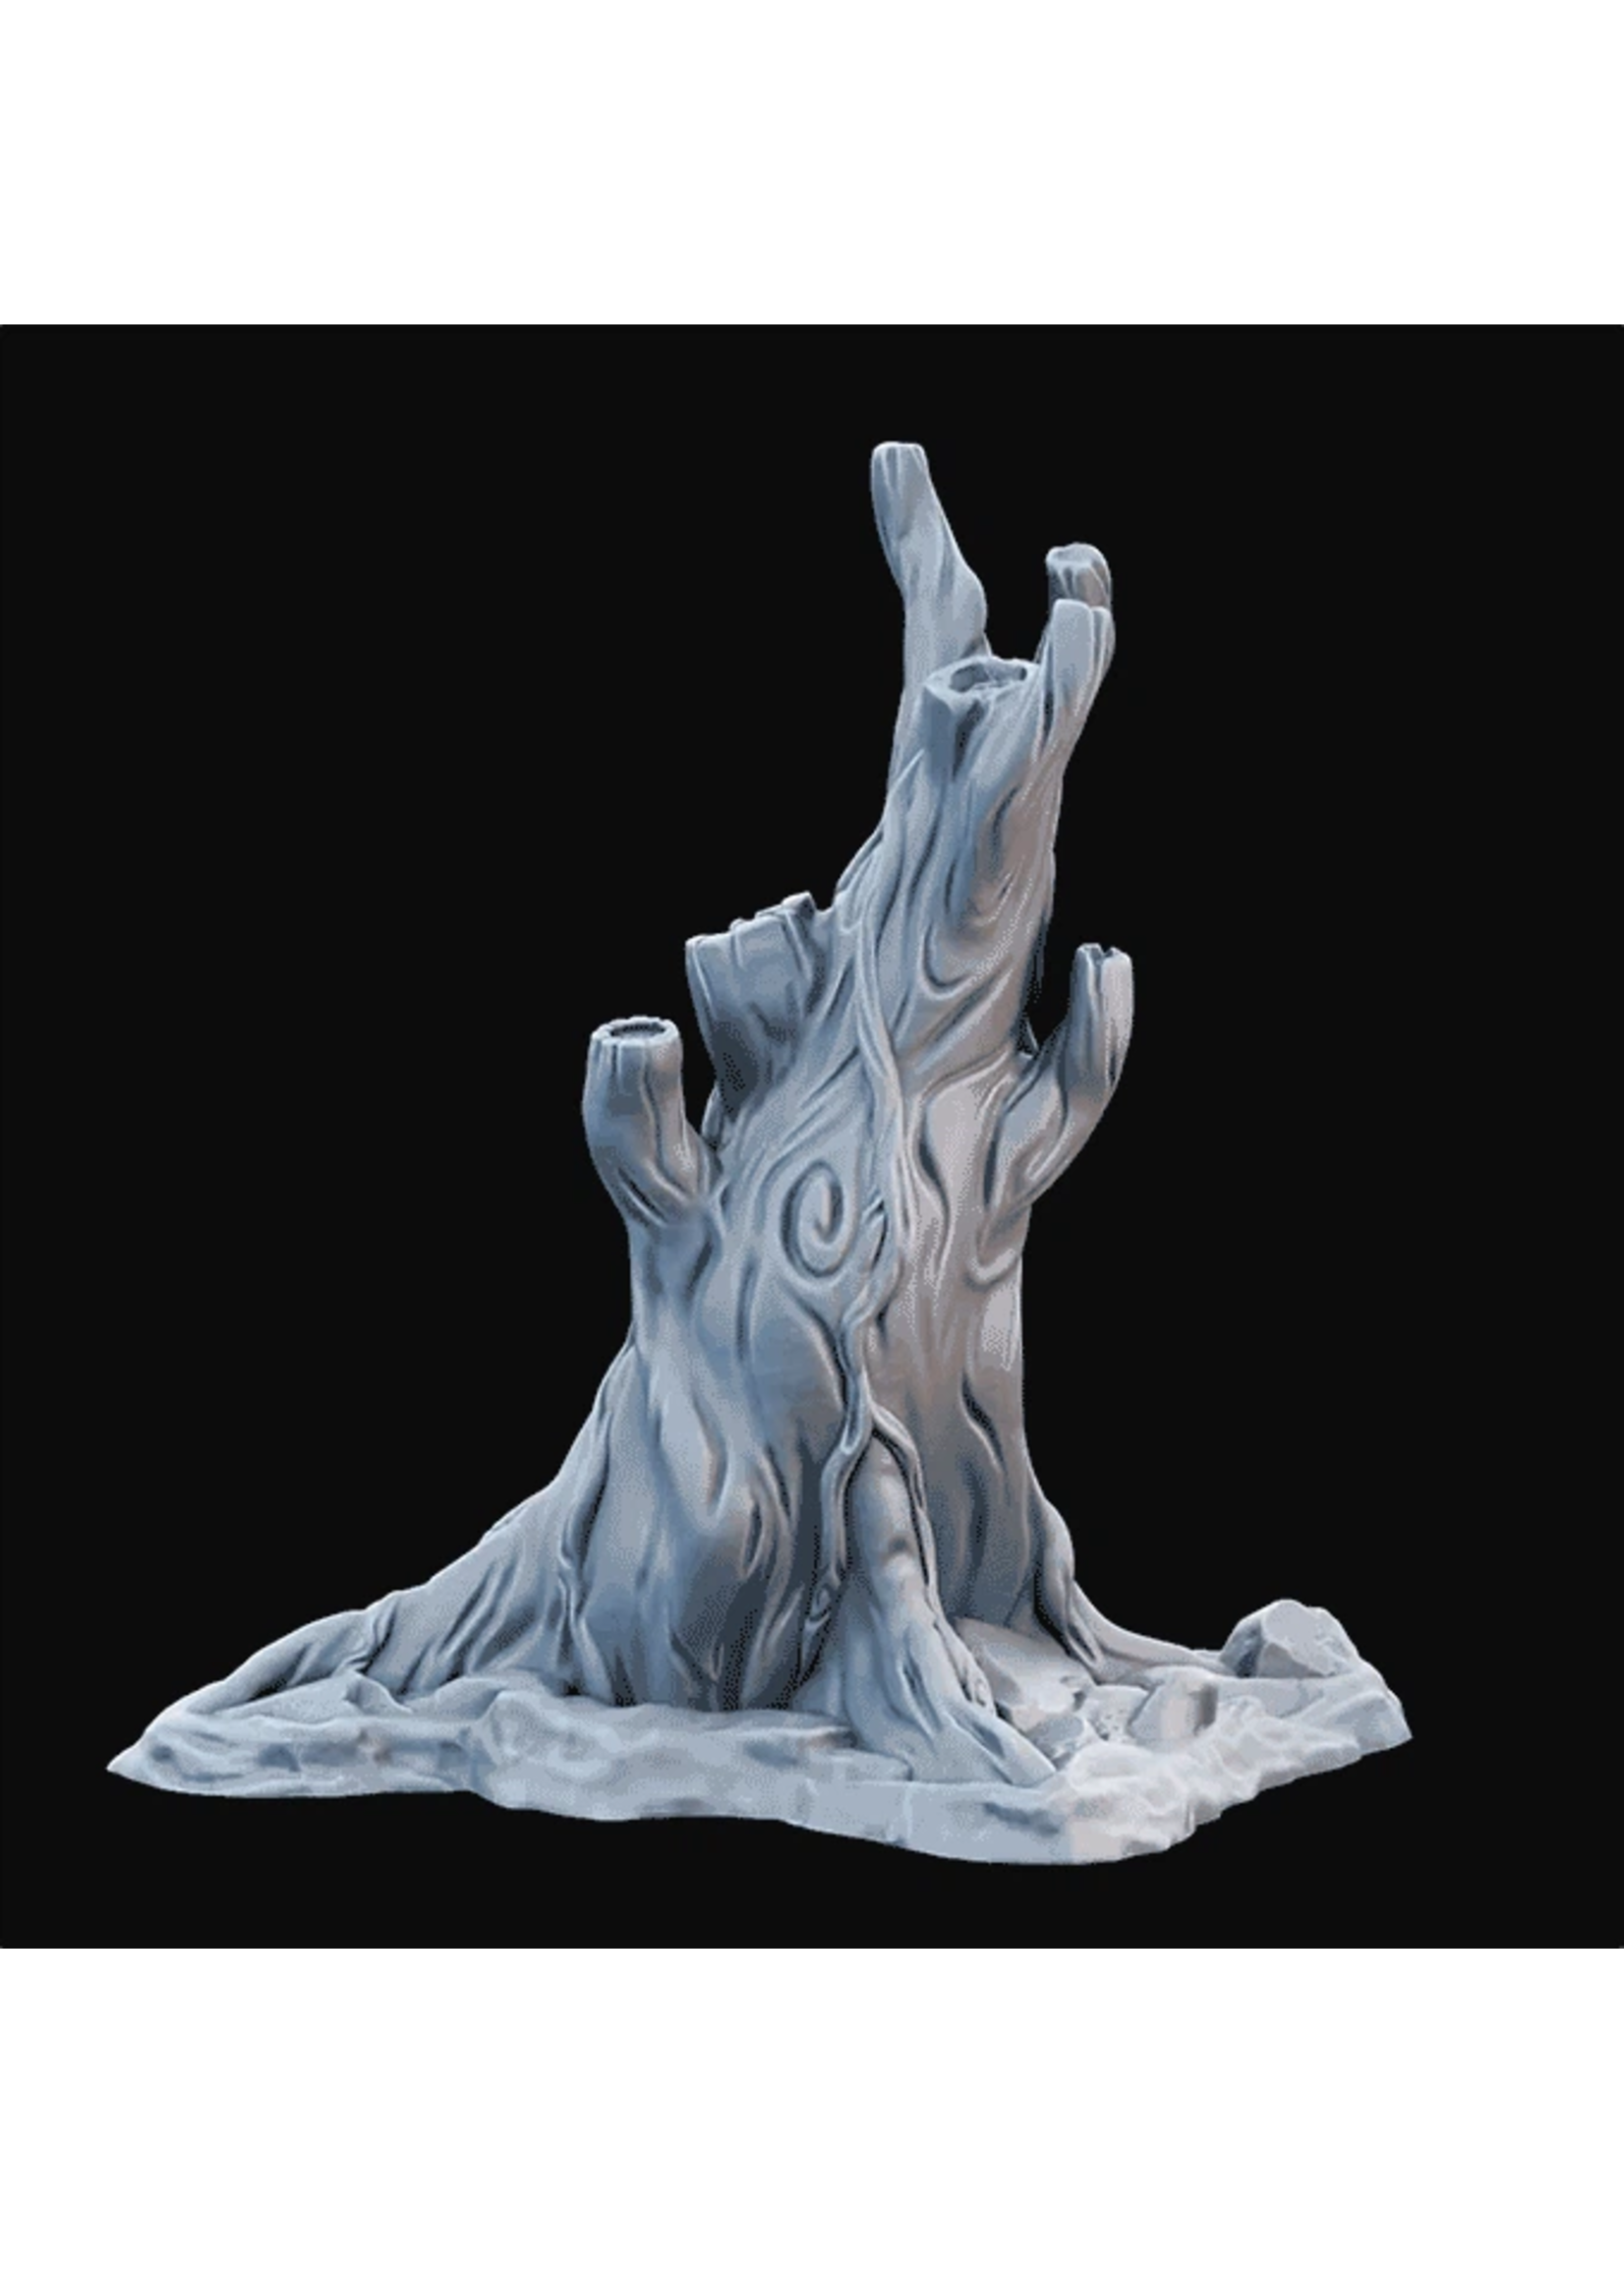 3D Printed Miniature - Tree02 - Dungeons & Dragons - Desolate Plains KS